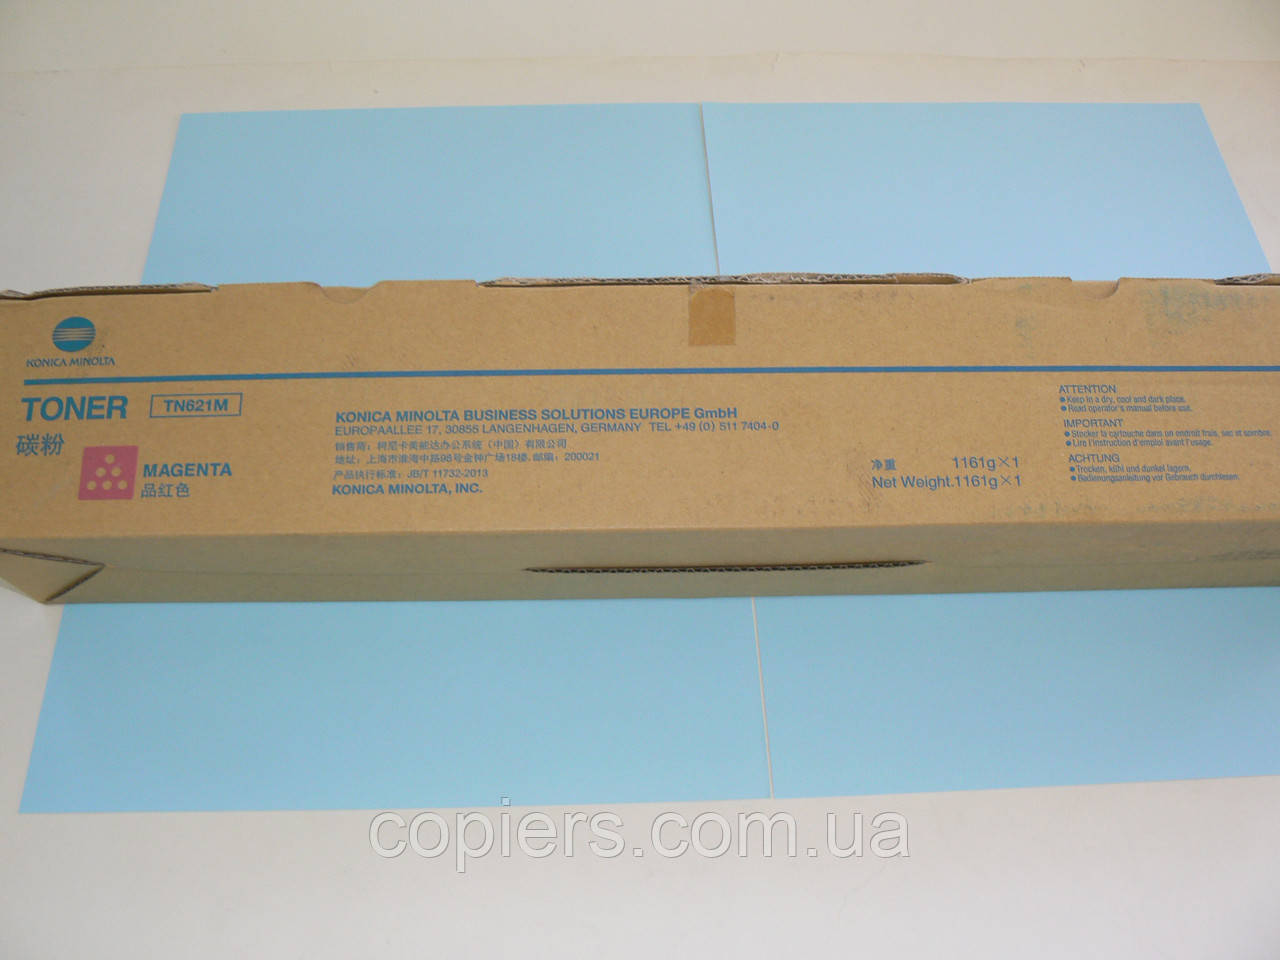 Тонер TN621 M Konica Minolta Bizhub Press C71hc, оригинал